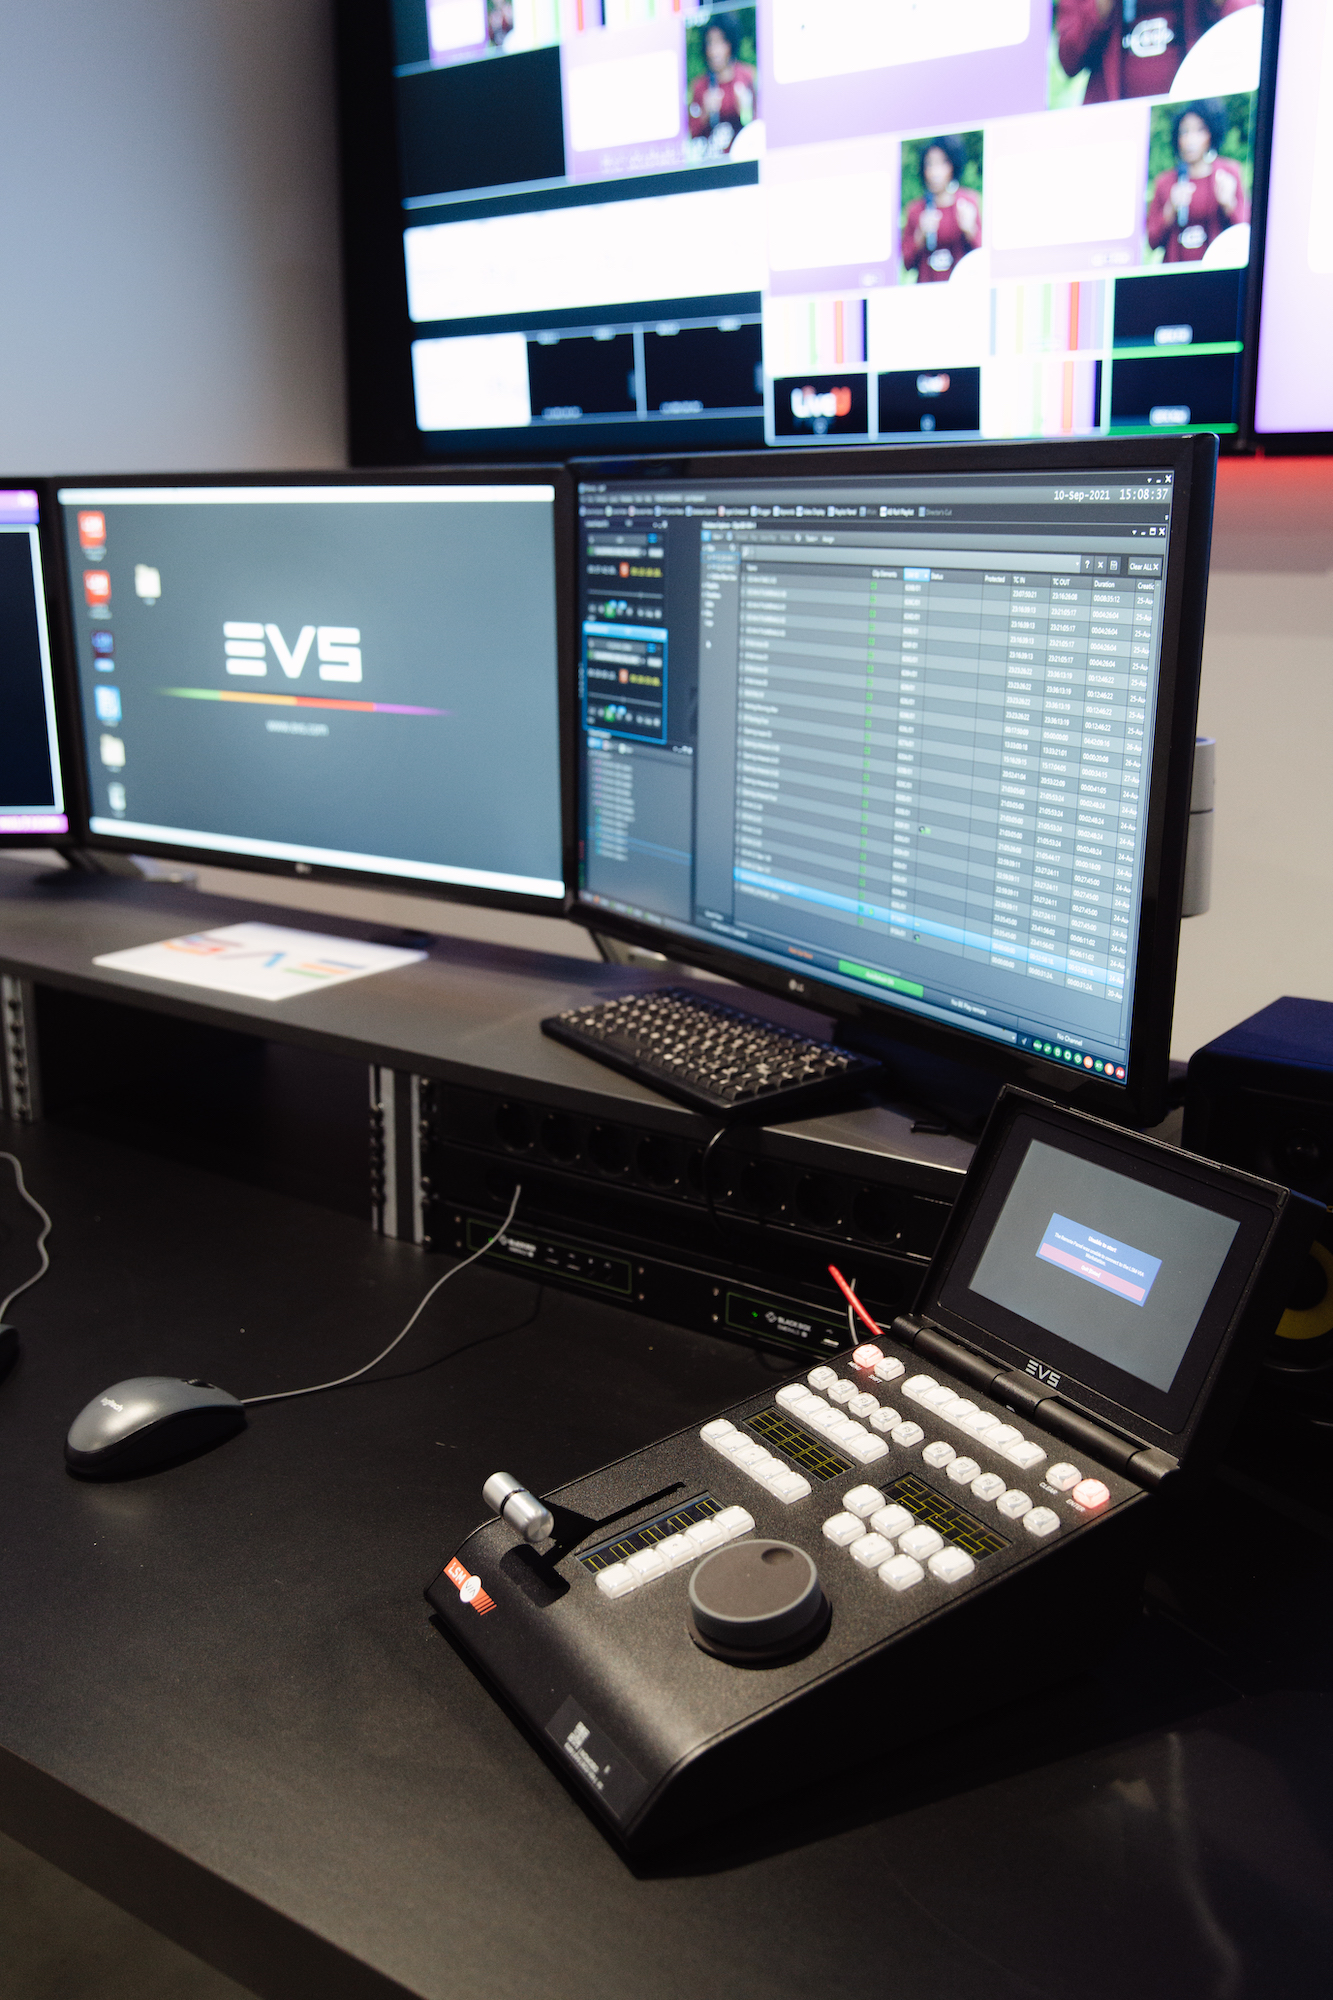 NOMOBO EVS XT XS Via Xfile IPdirector